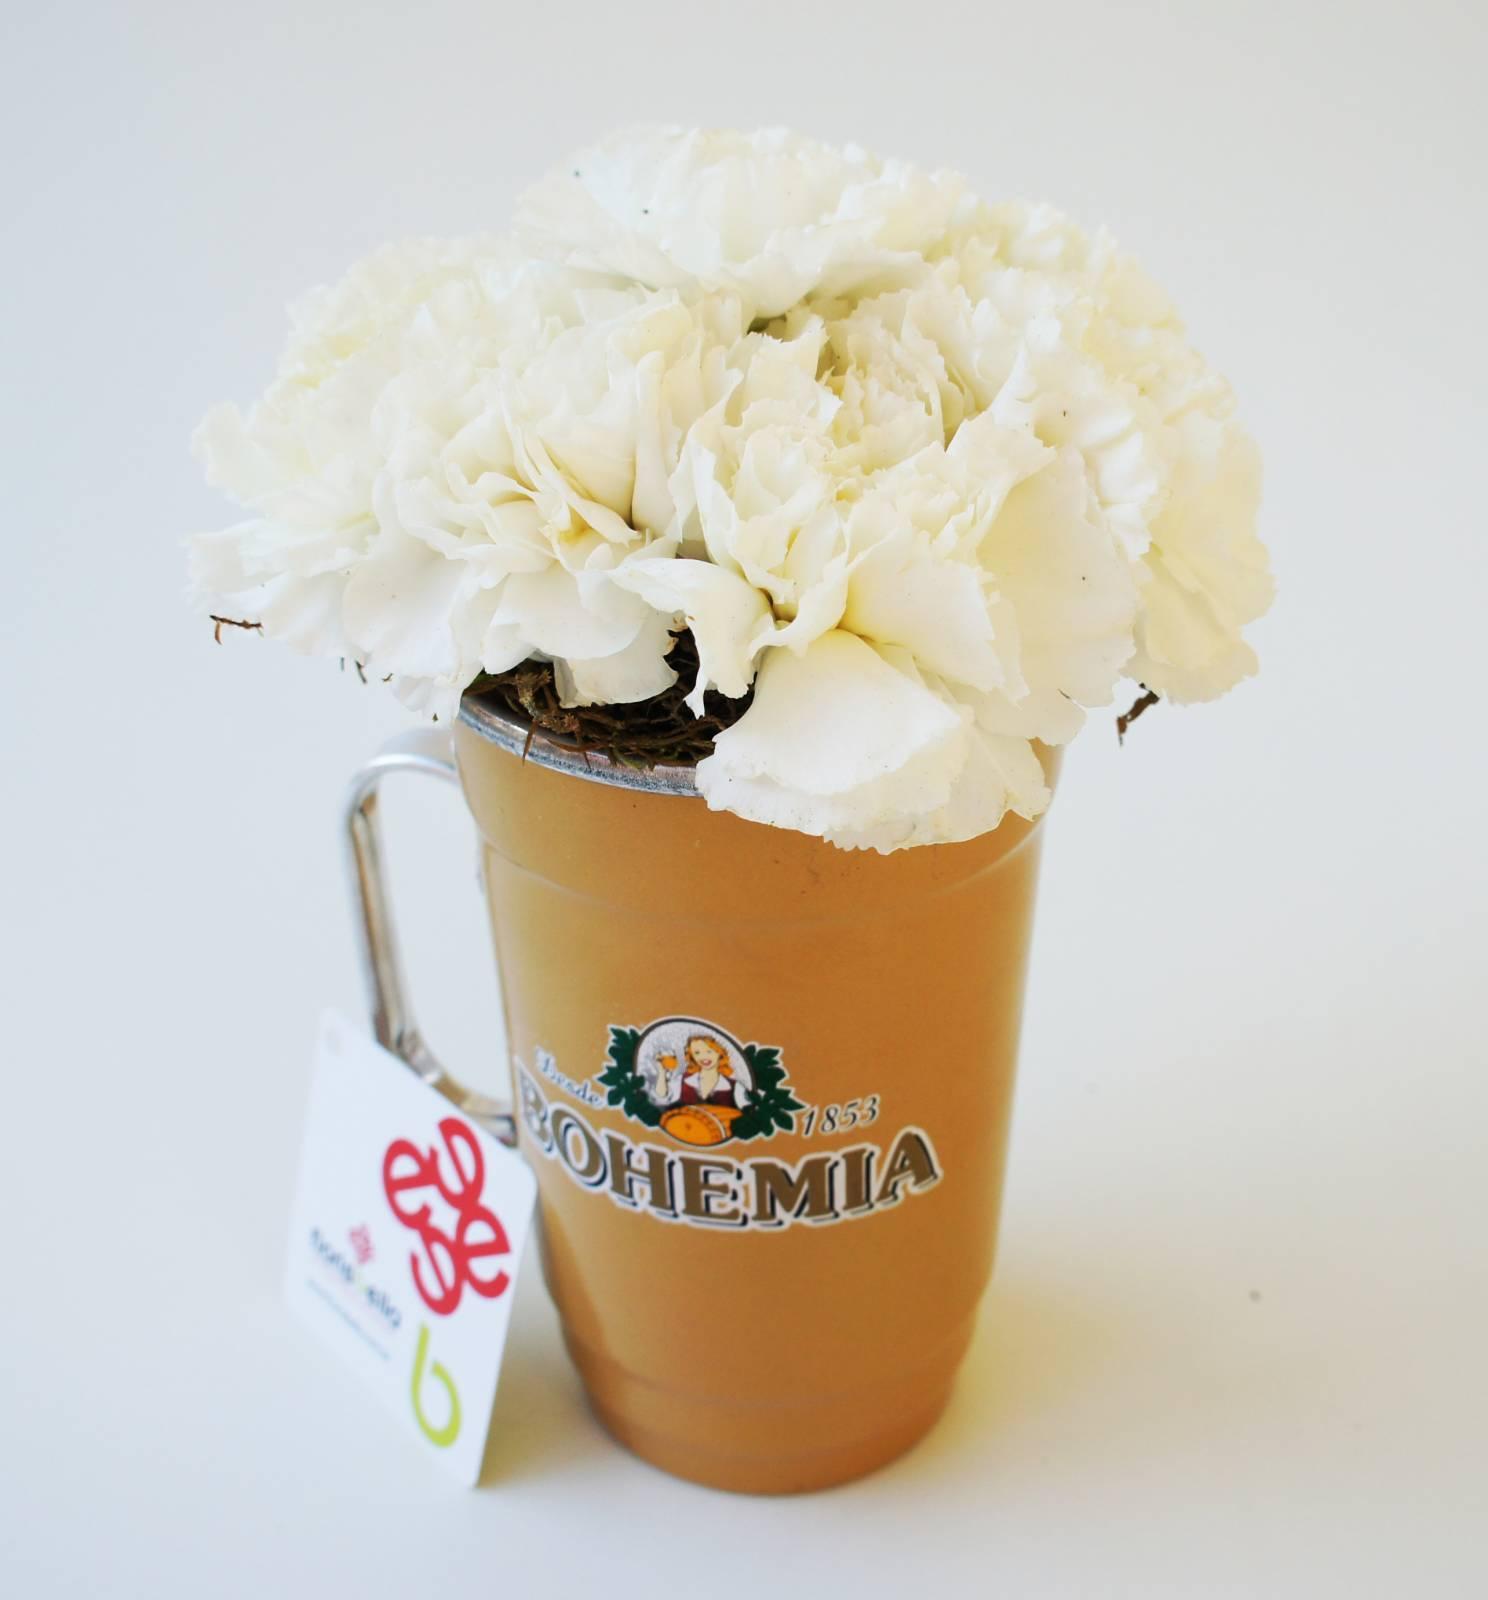 Pai Cervejeiro Bohemia  - Florisbella - Matriz Campinas